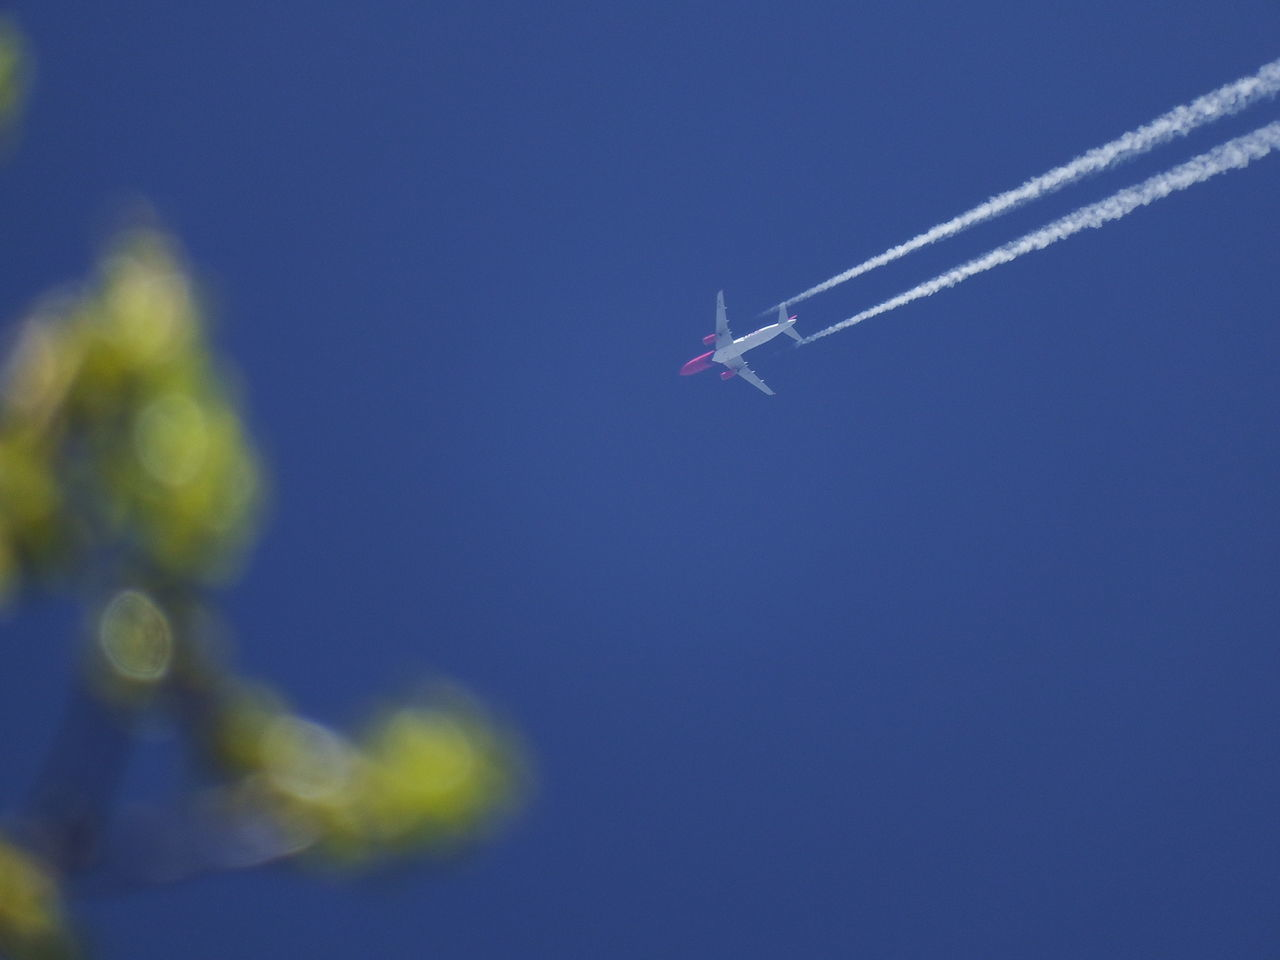 AIRPLANE Leaving Vapor Trail In Sky